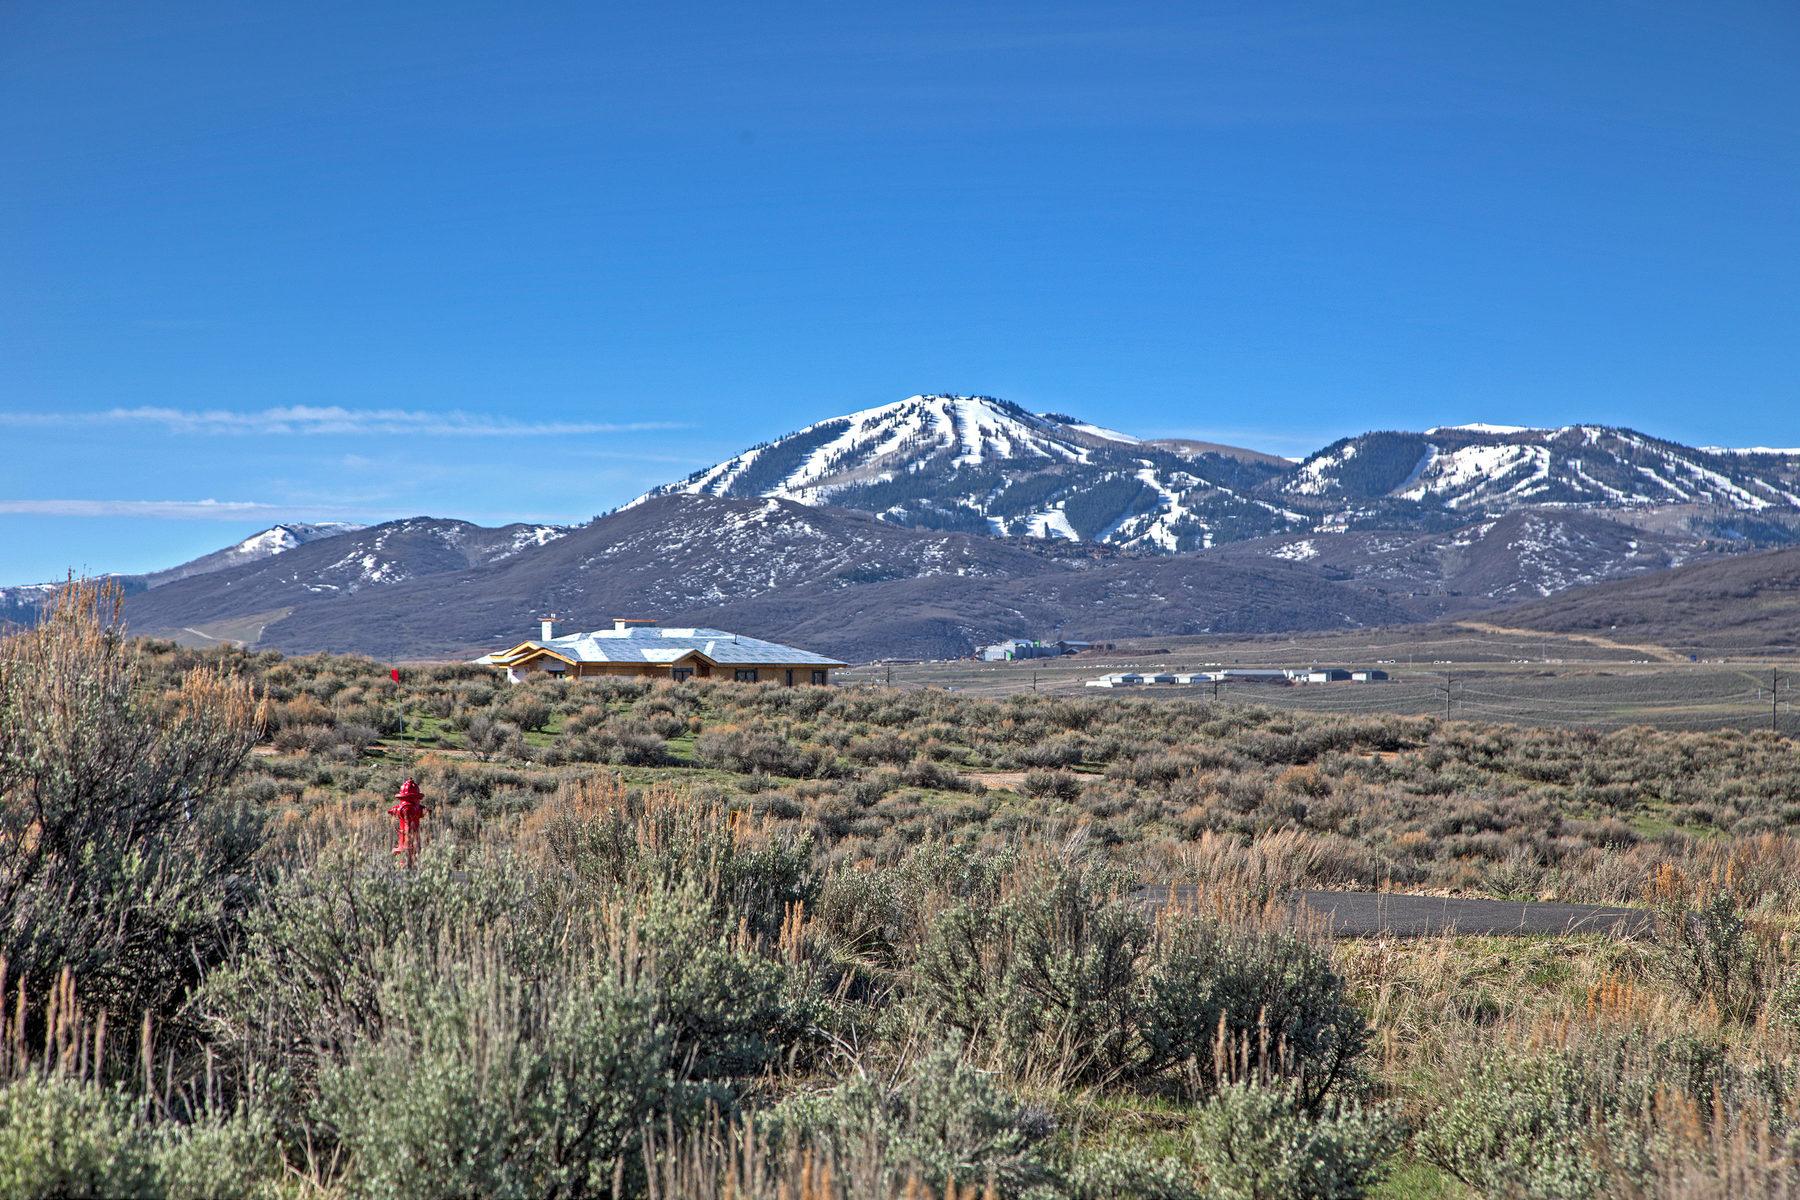 Land for Sale at Promontory Homesite Ski Mountain Views 2579 Julia Ct Lot 44 Park City, Utah, 84098 United States